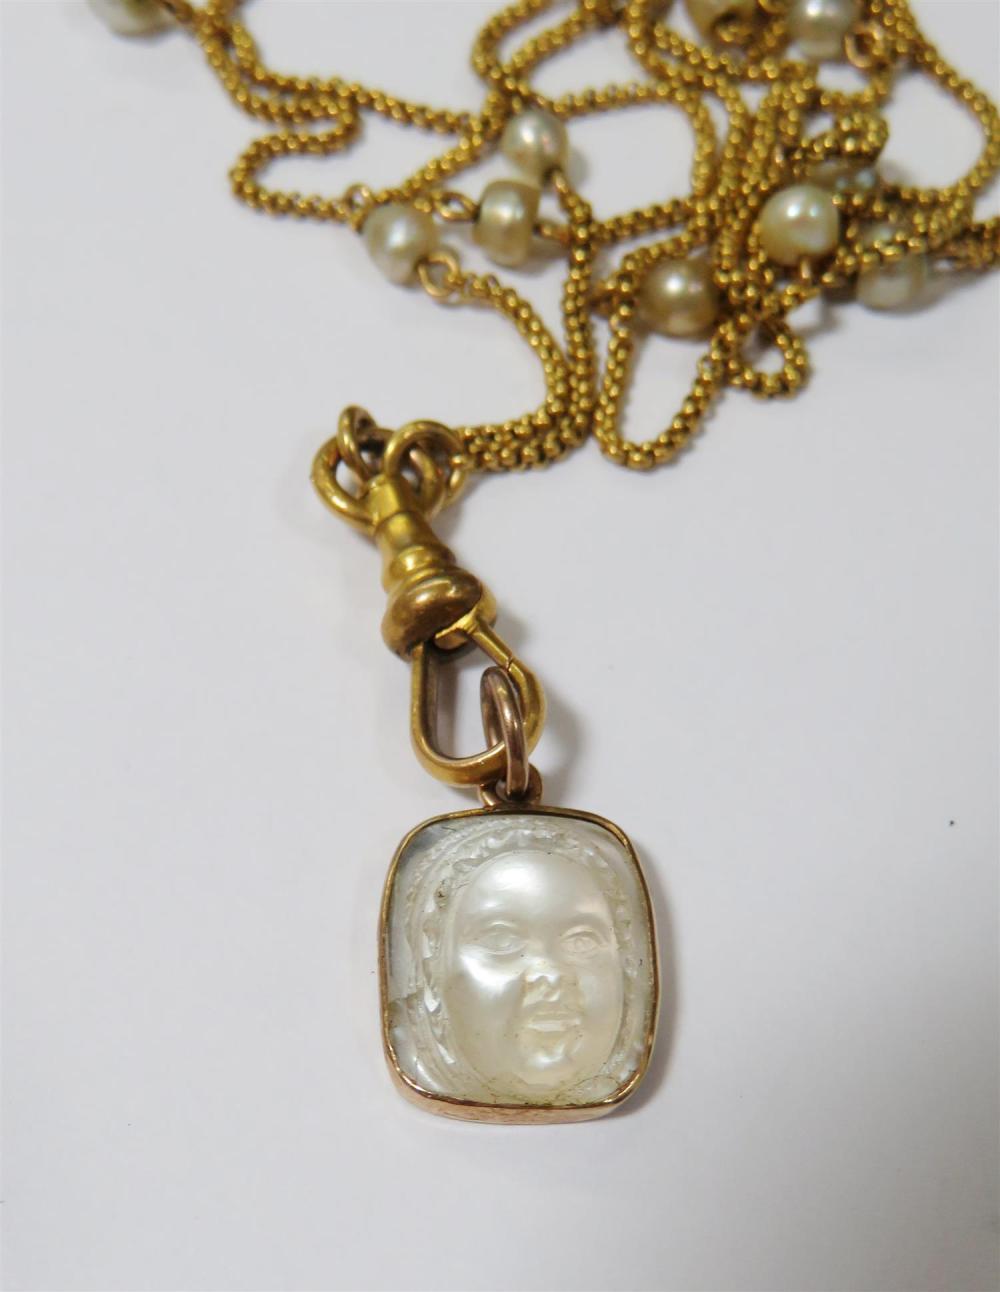 Antique coral and moonstone necklaces (2pcs)